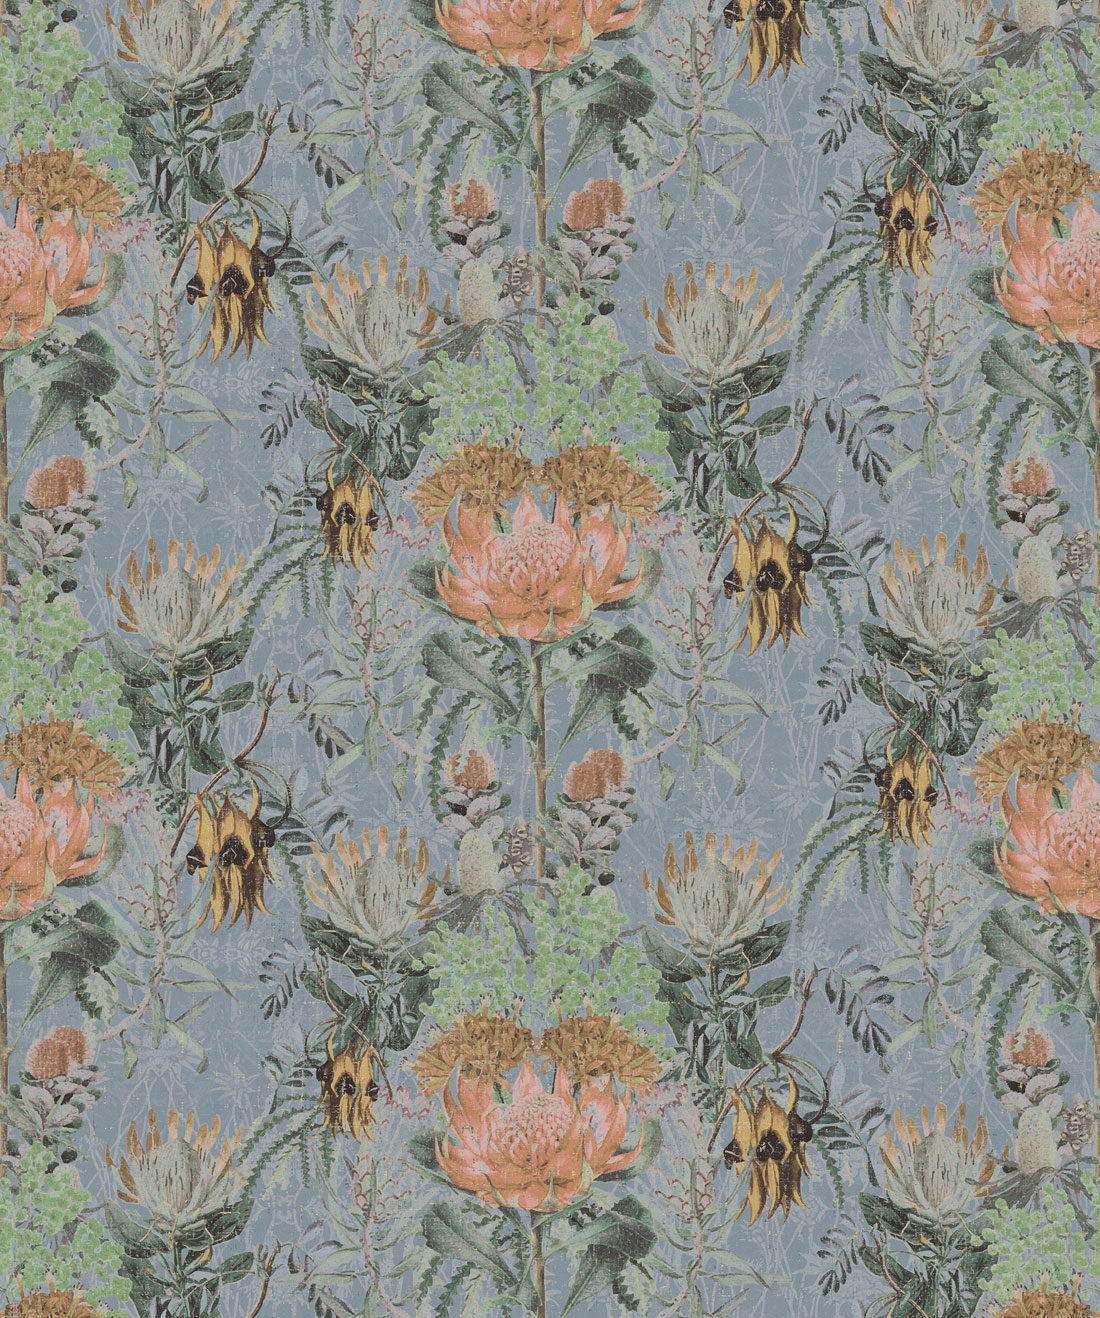 Simcox Wildflowers Wallpaper